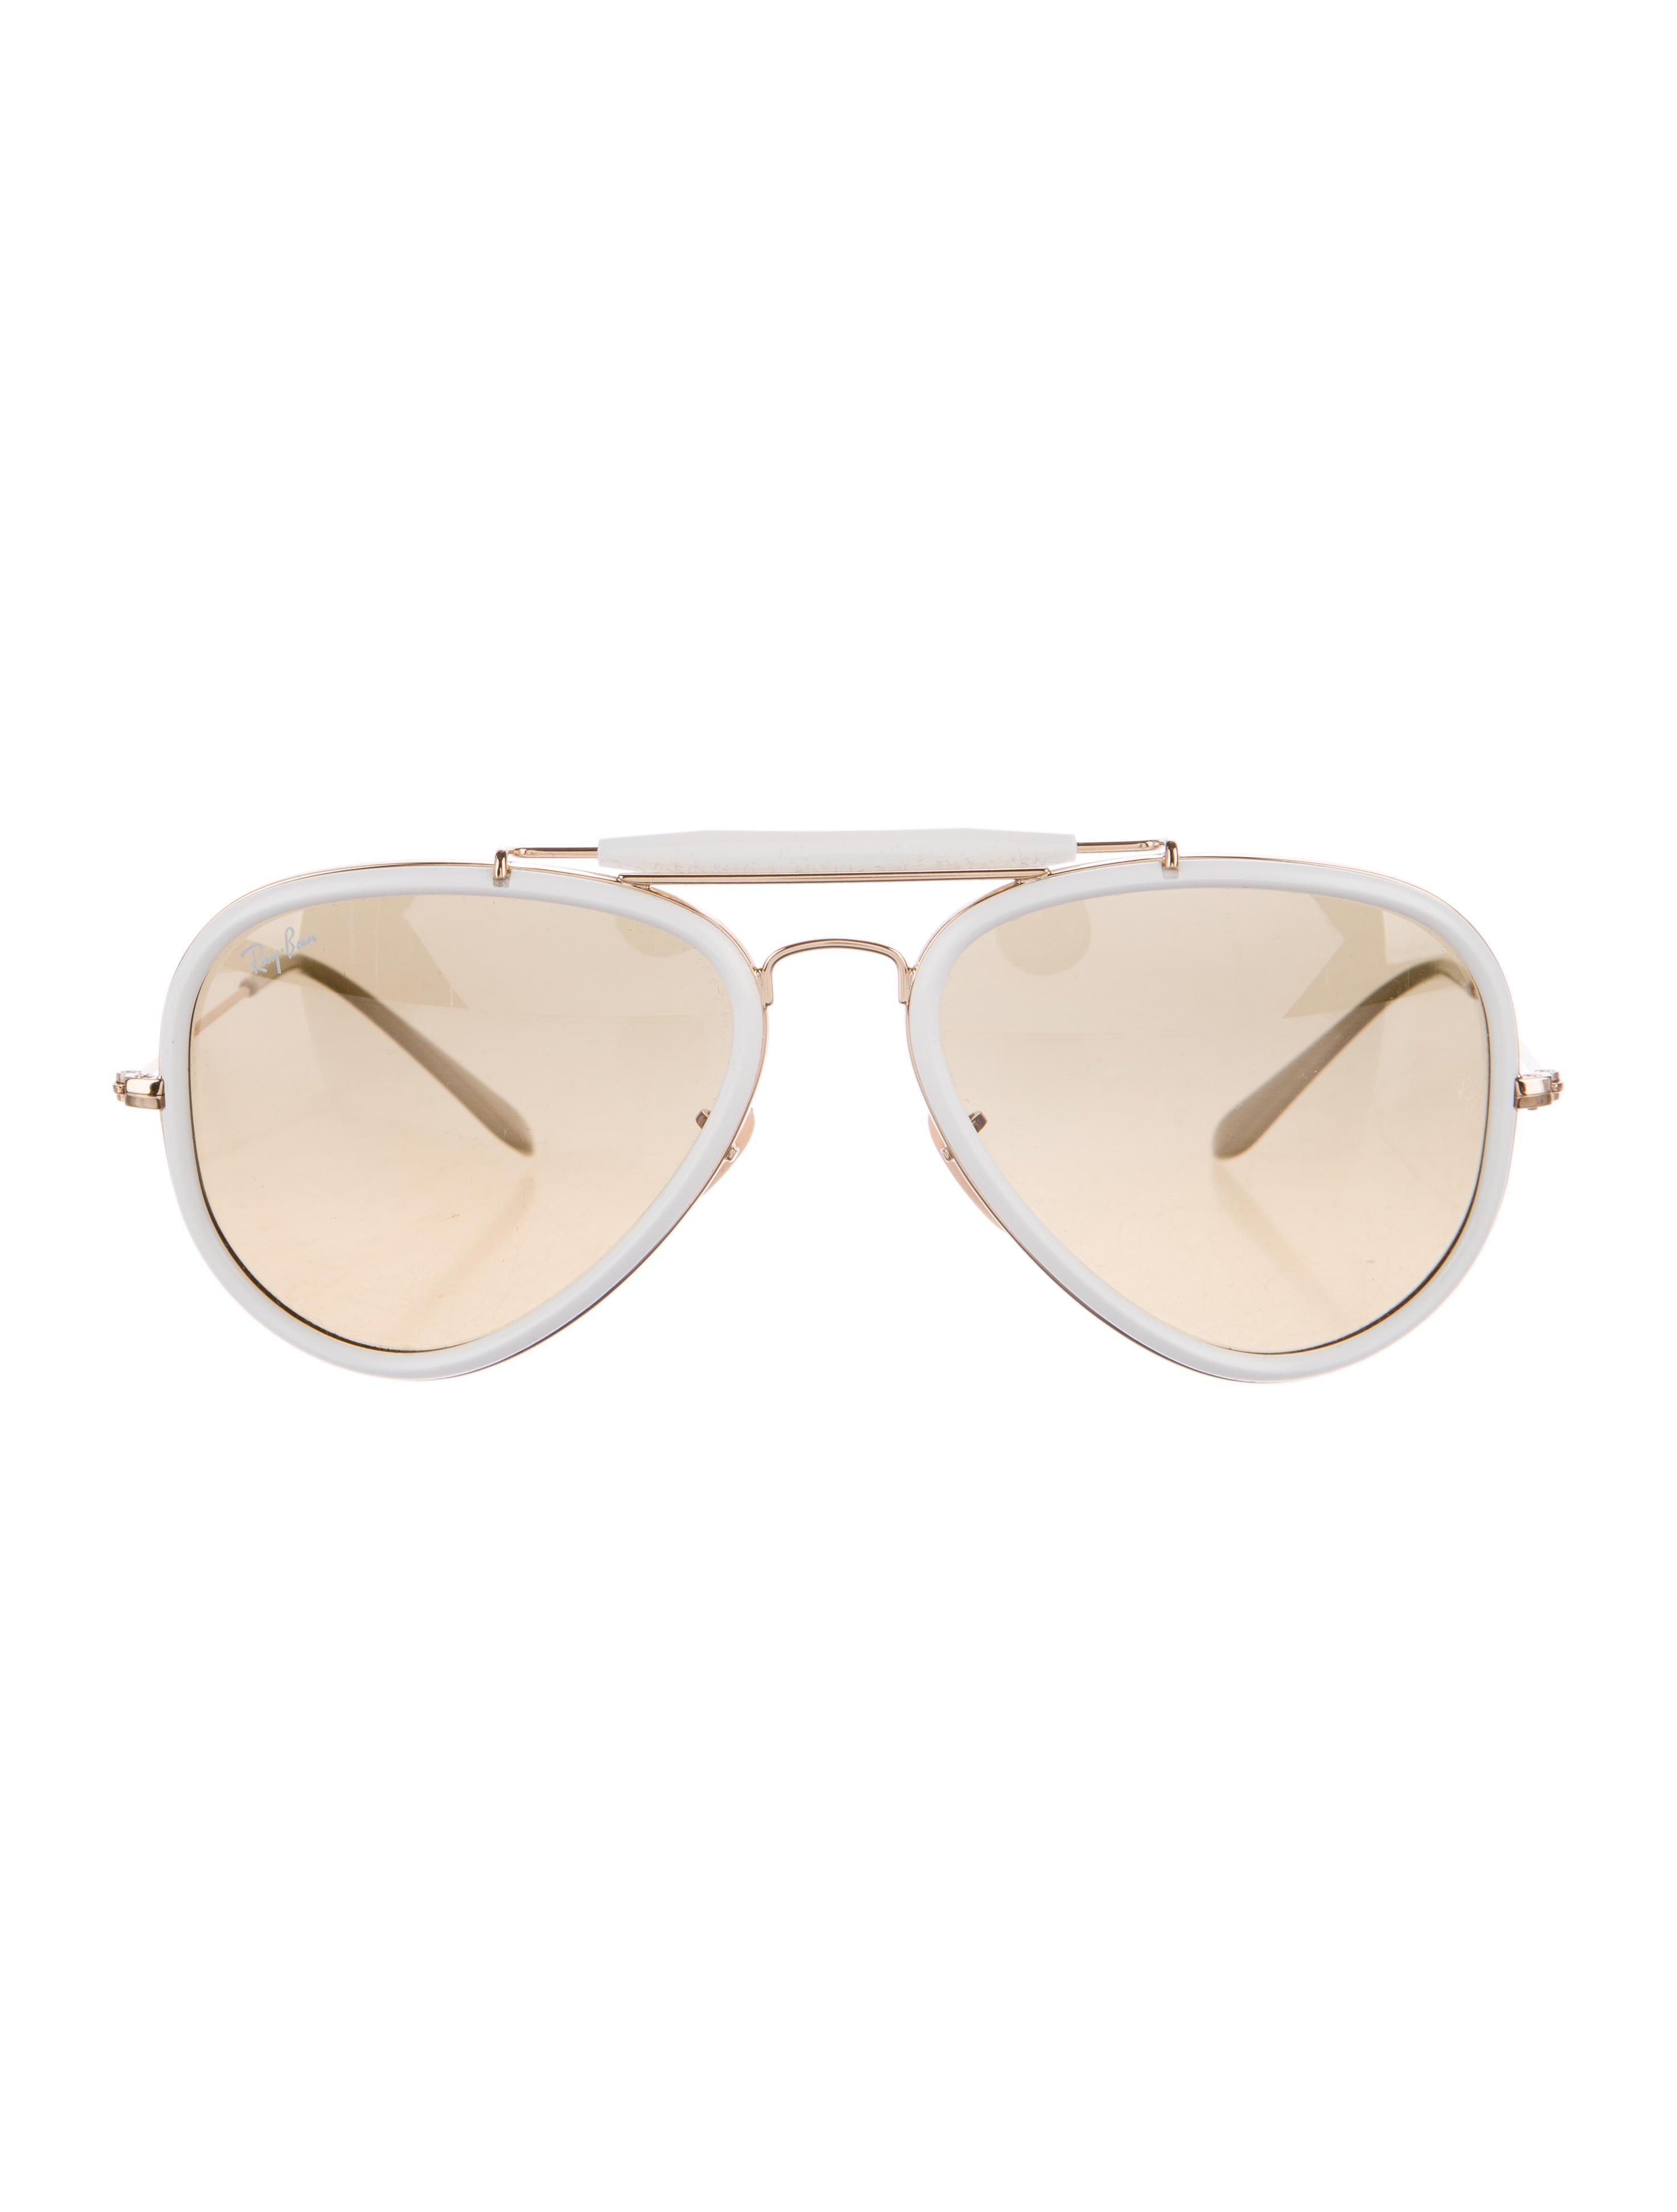 77b03990fa Ray Ban Road Spirit 3428 Sunglasses « One More Soul